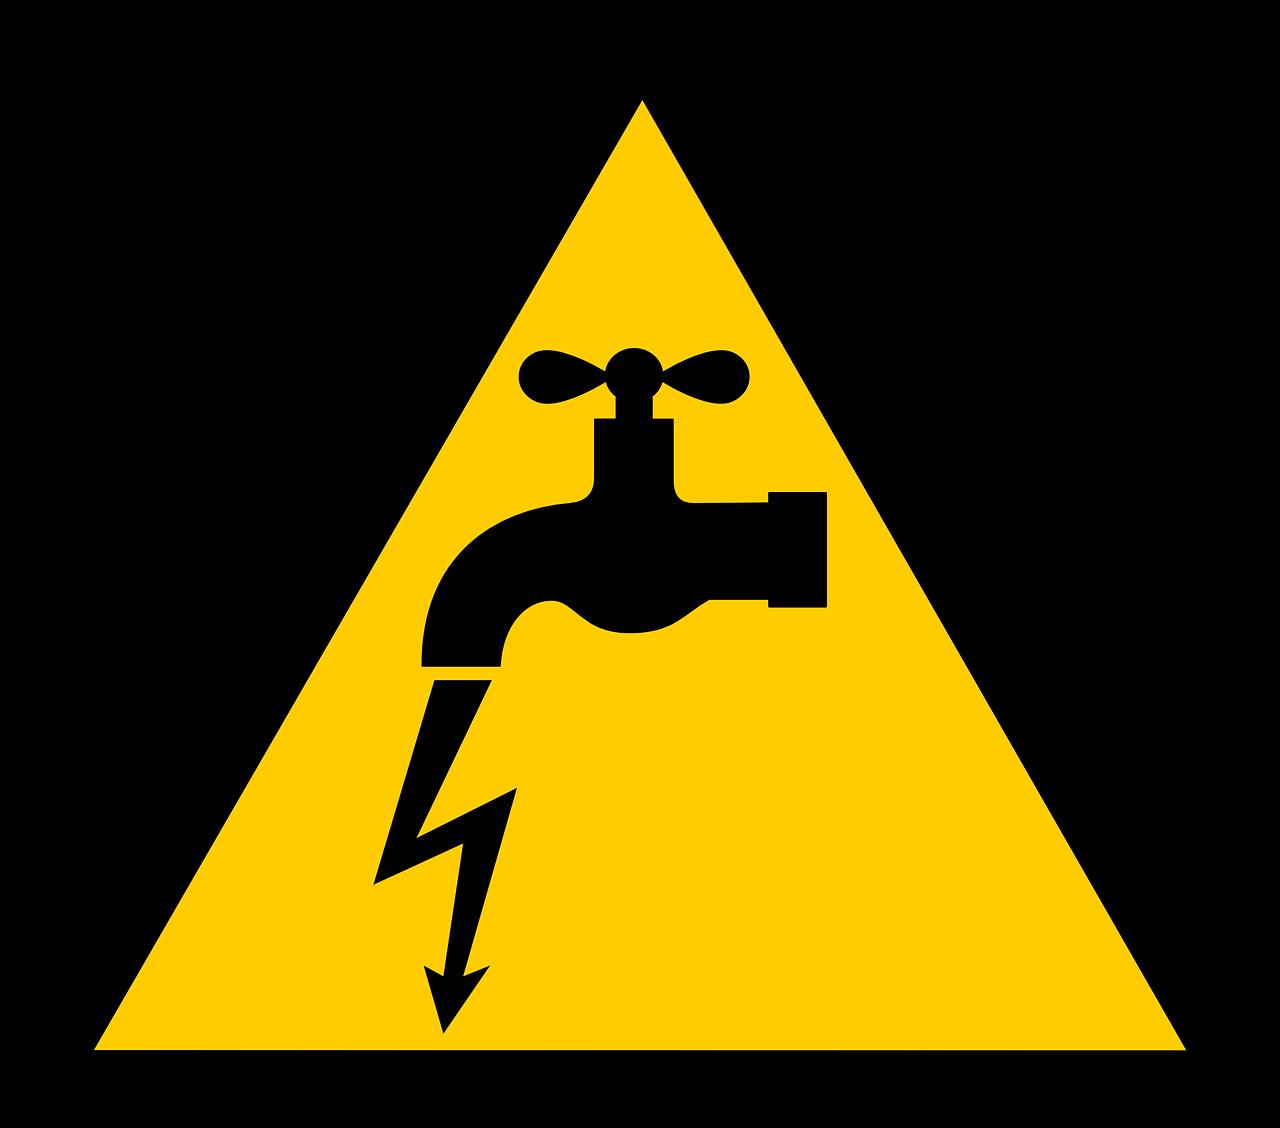 Warnschild: Elektrizität